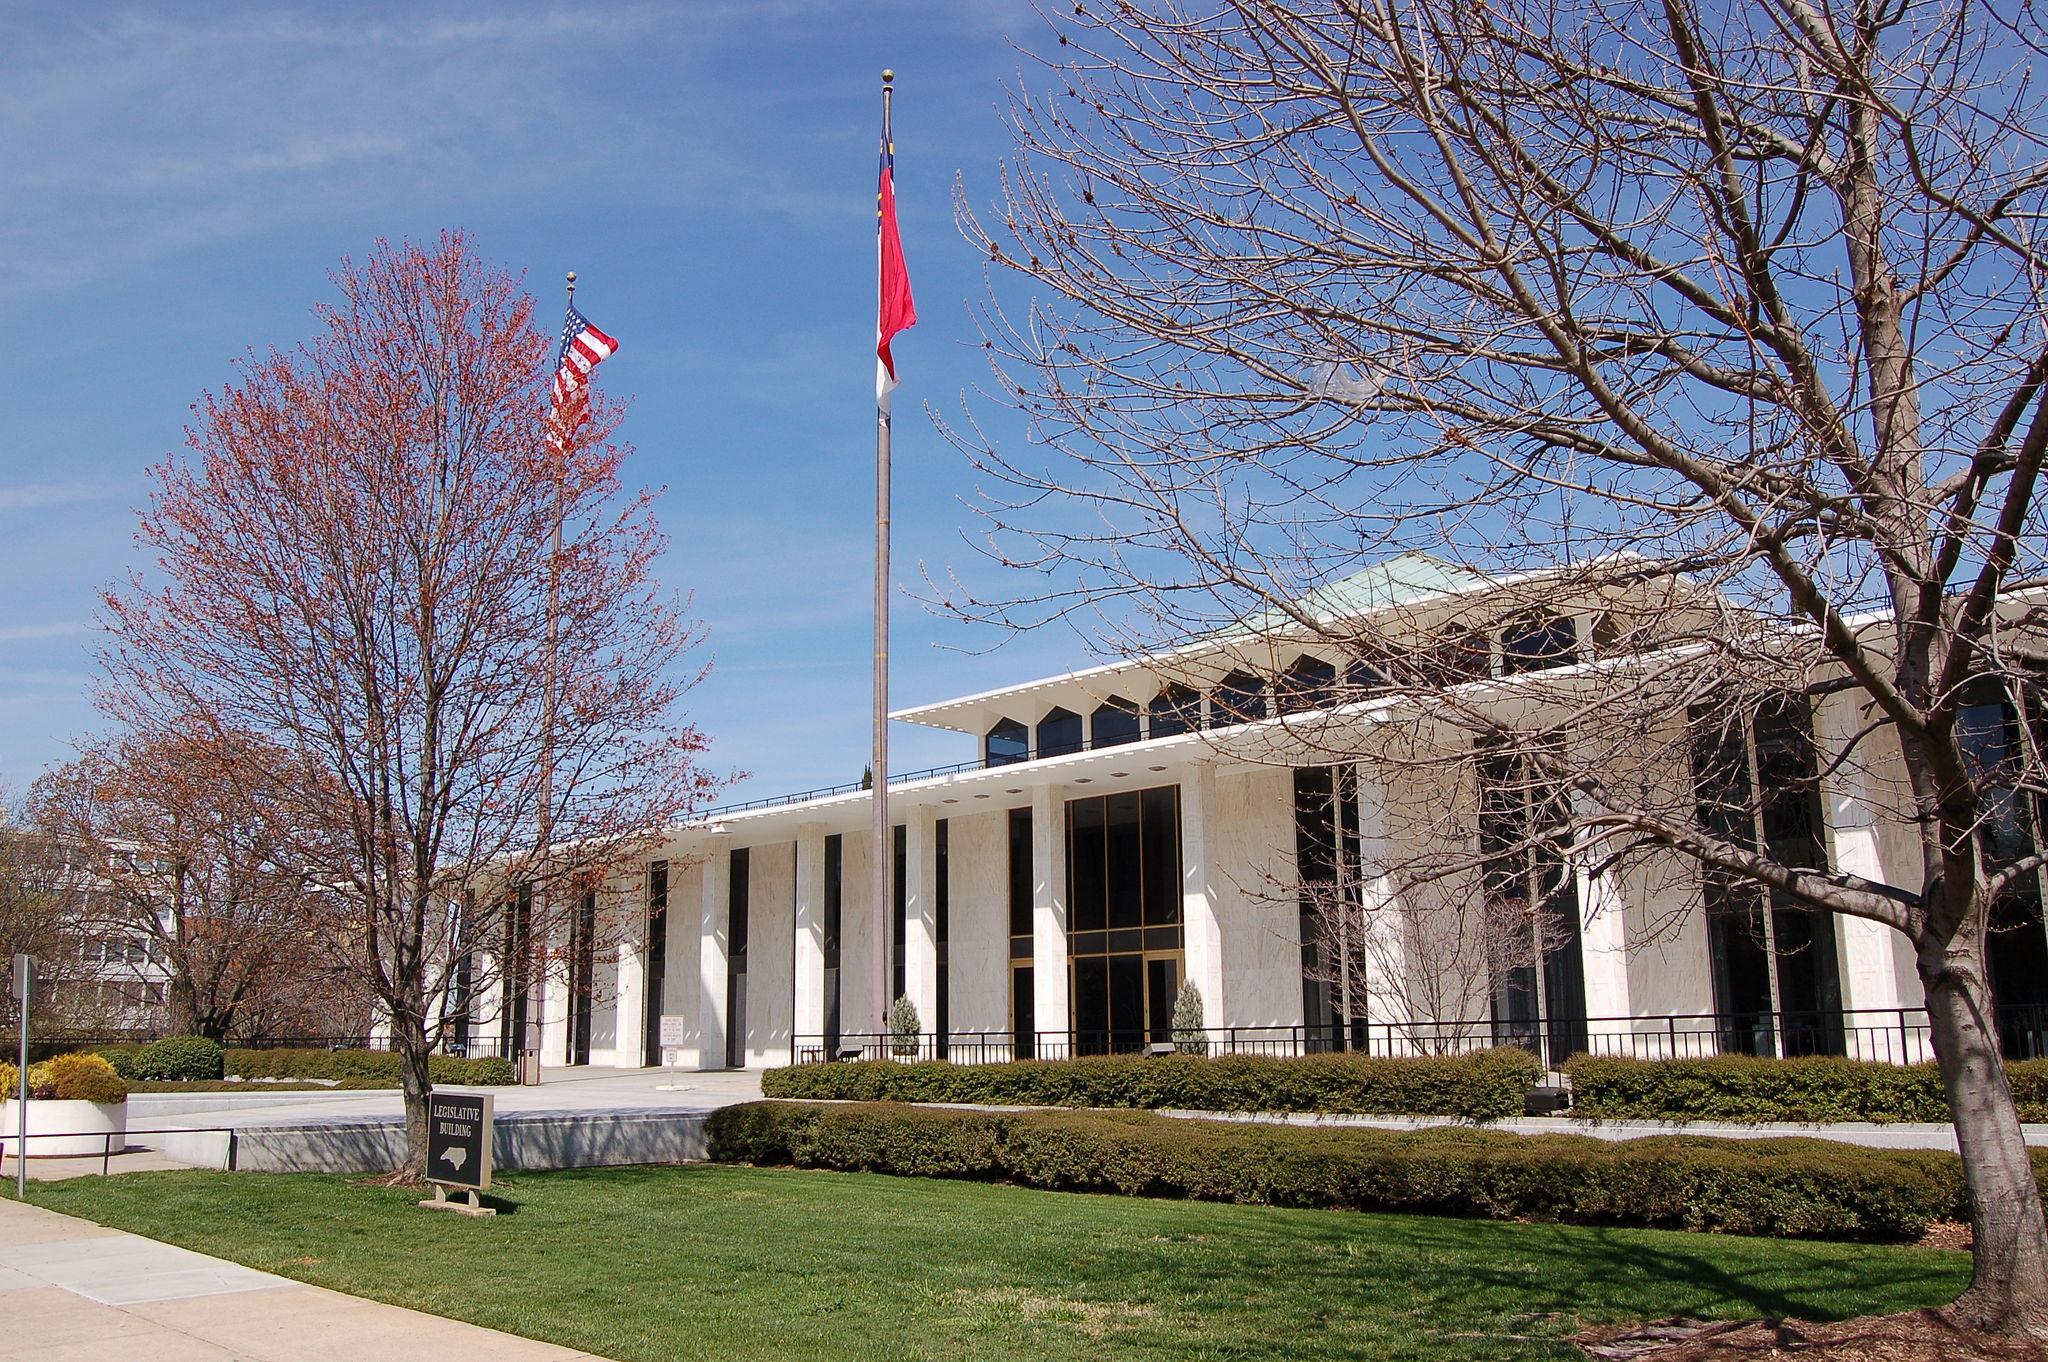 NC Legislature - jmTurner in commons.wikimedia.org